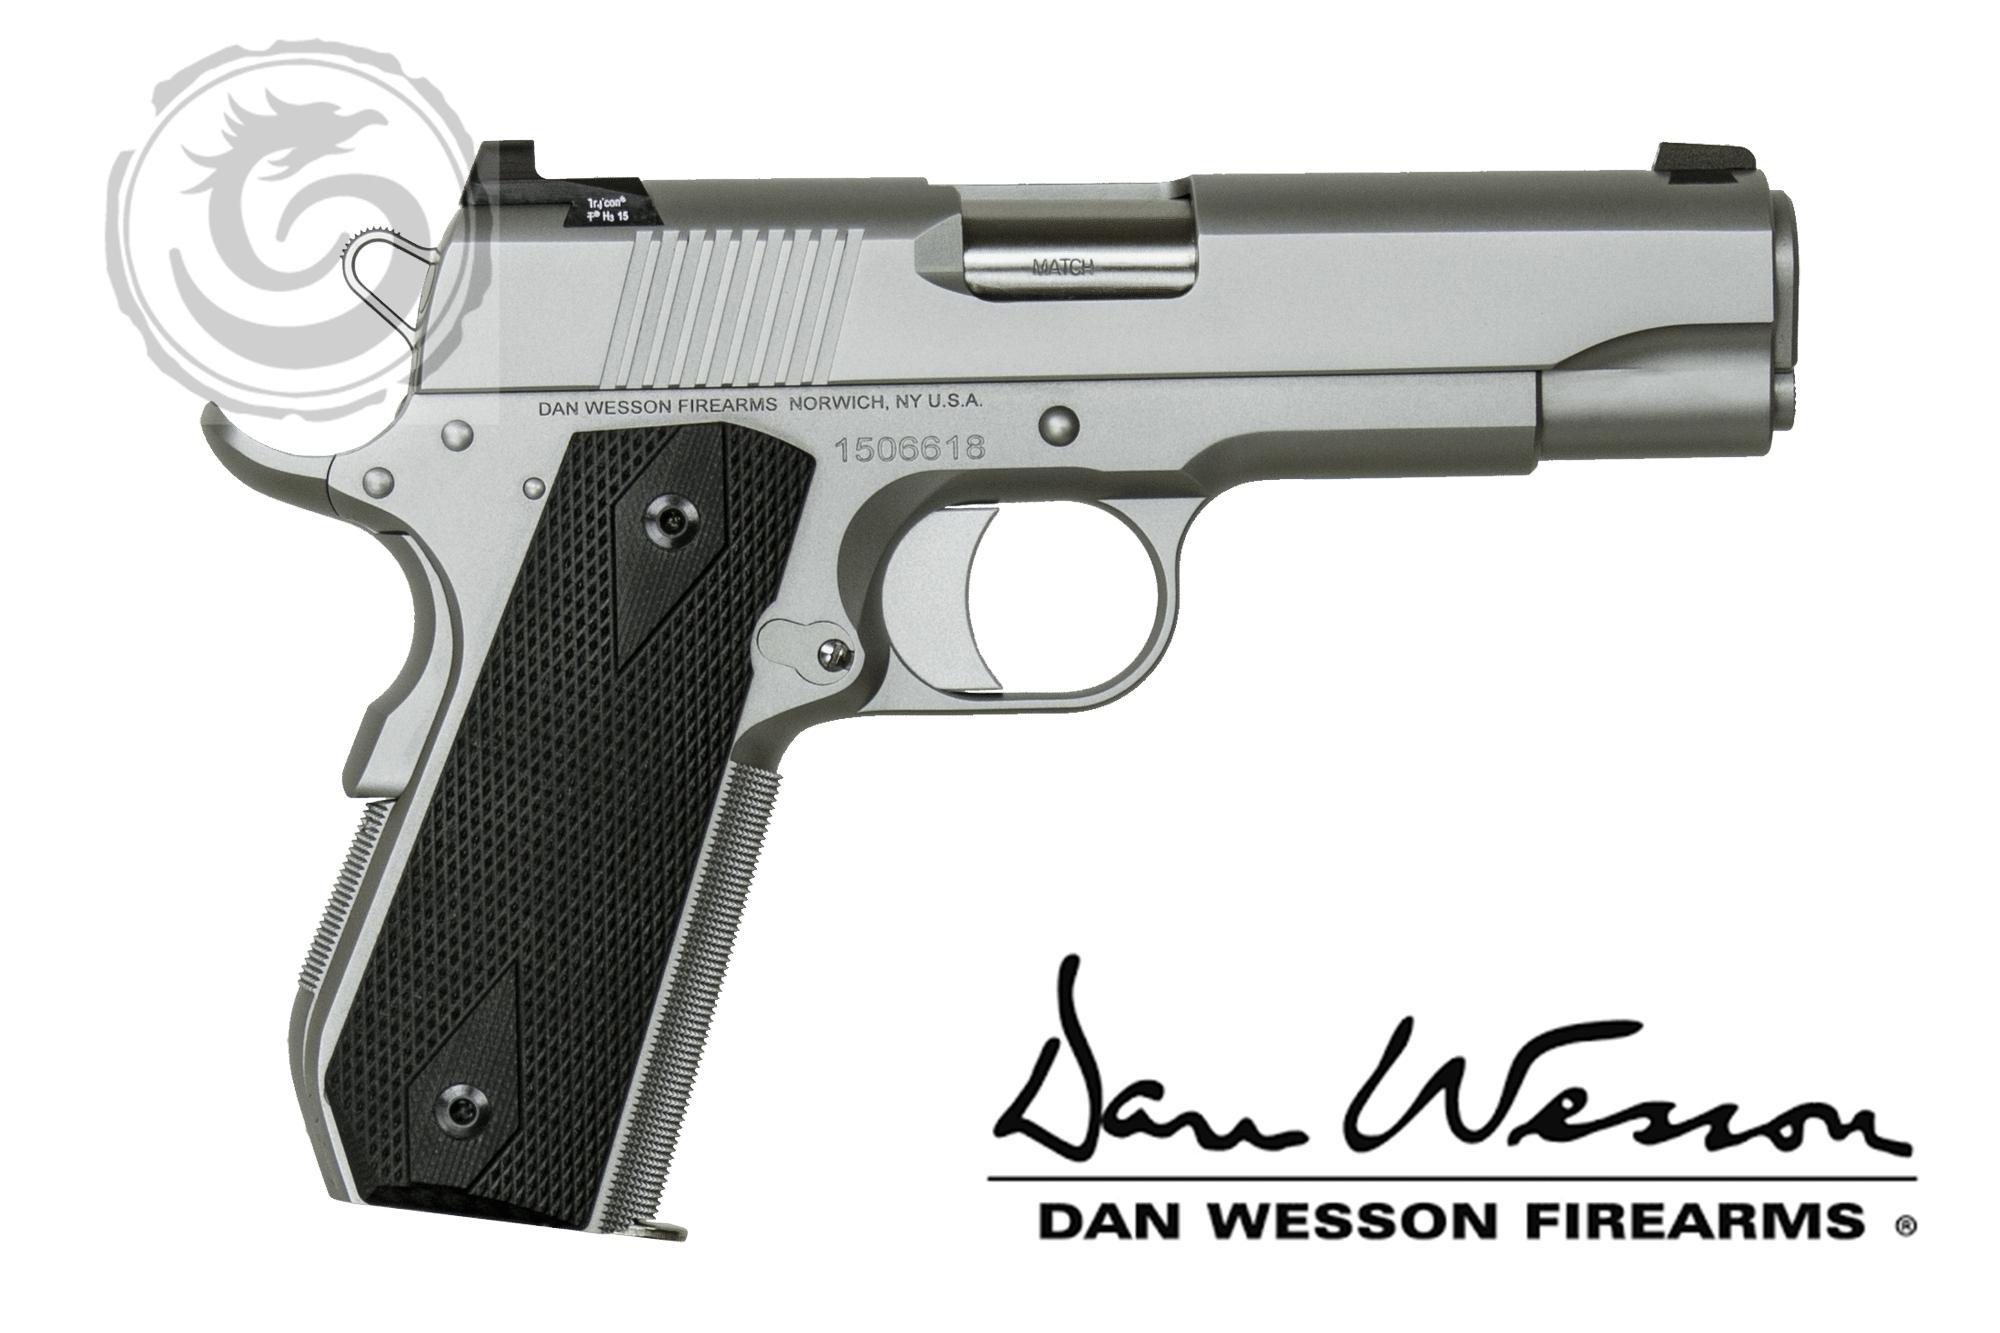 Dan-Wesson-V-Bob-45-ACP-SS-Bobtail-Commander-right_副本